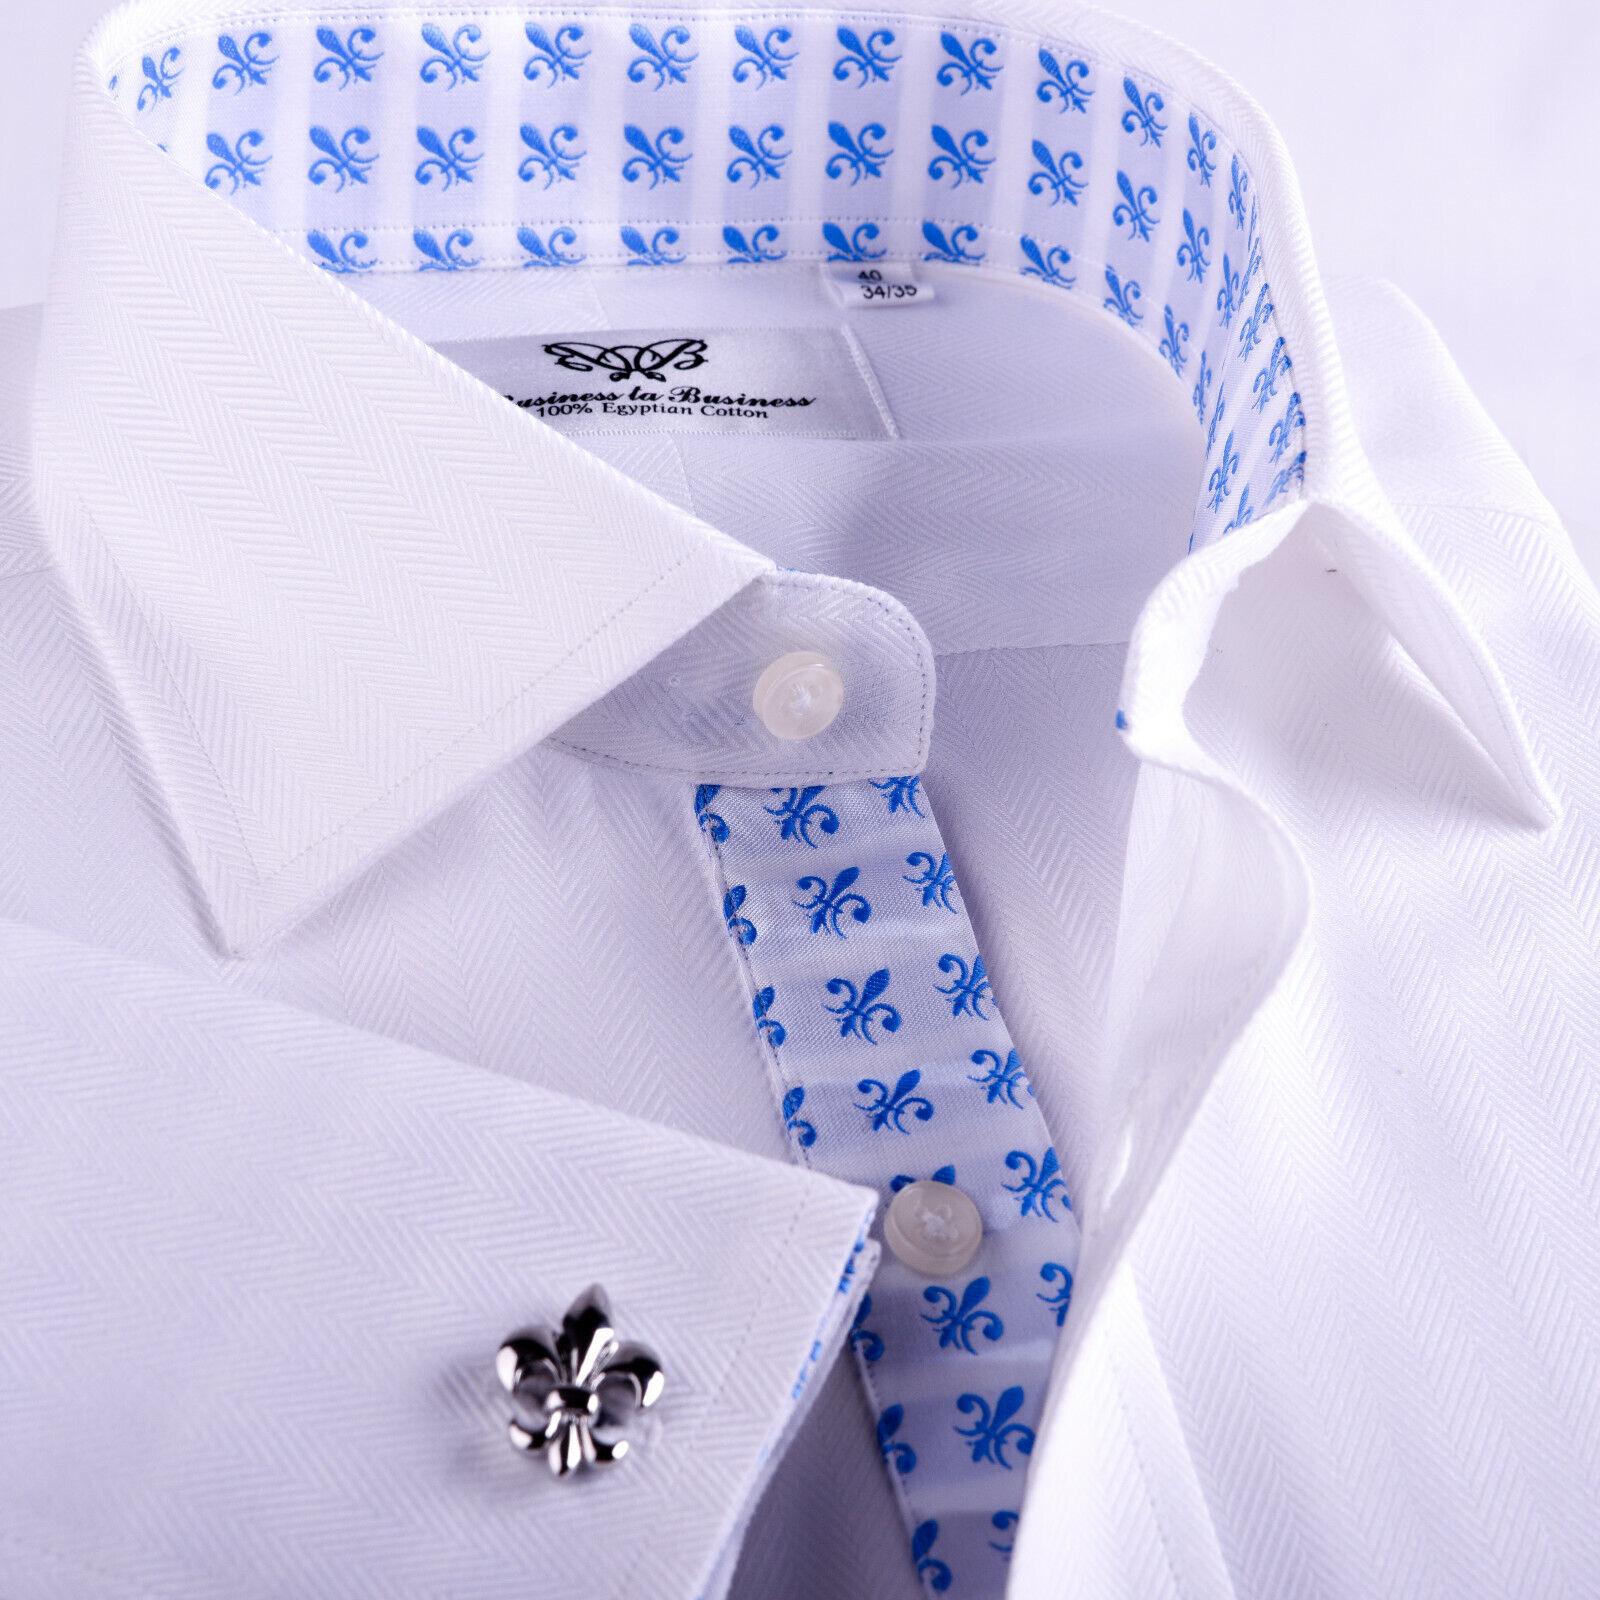 White Herringbone Formal Business Dress Shirt Mens B2B Designer Clothing Apparel